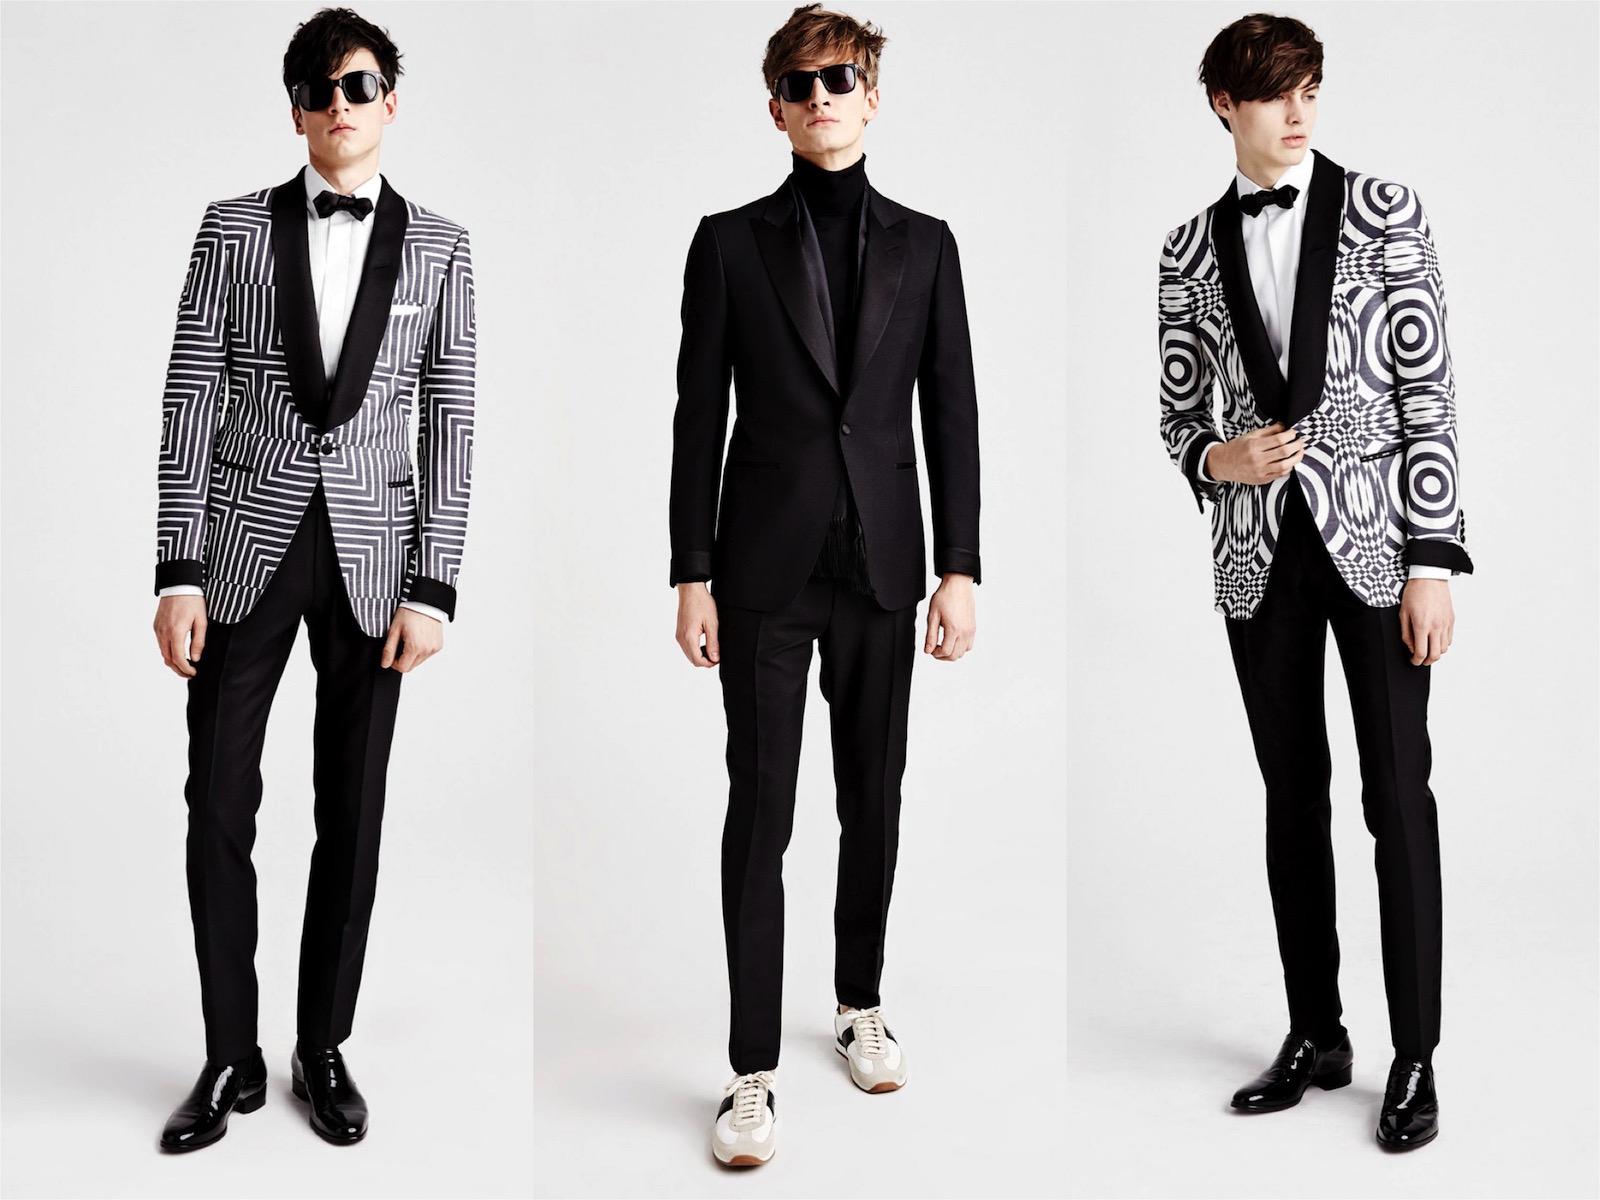 Tom Ford Menswear Fall Winter 2015 (4)